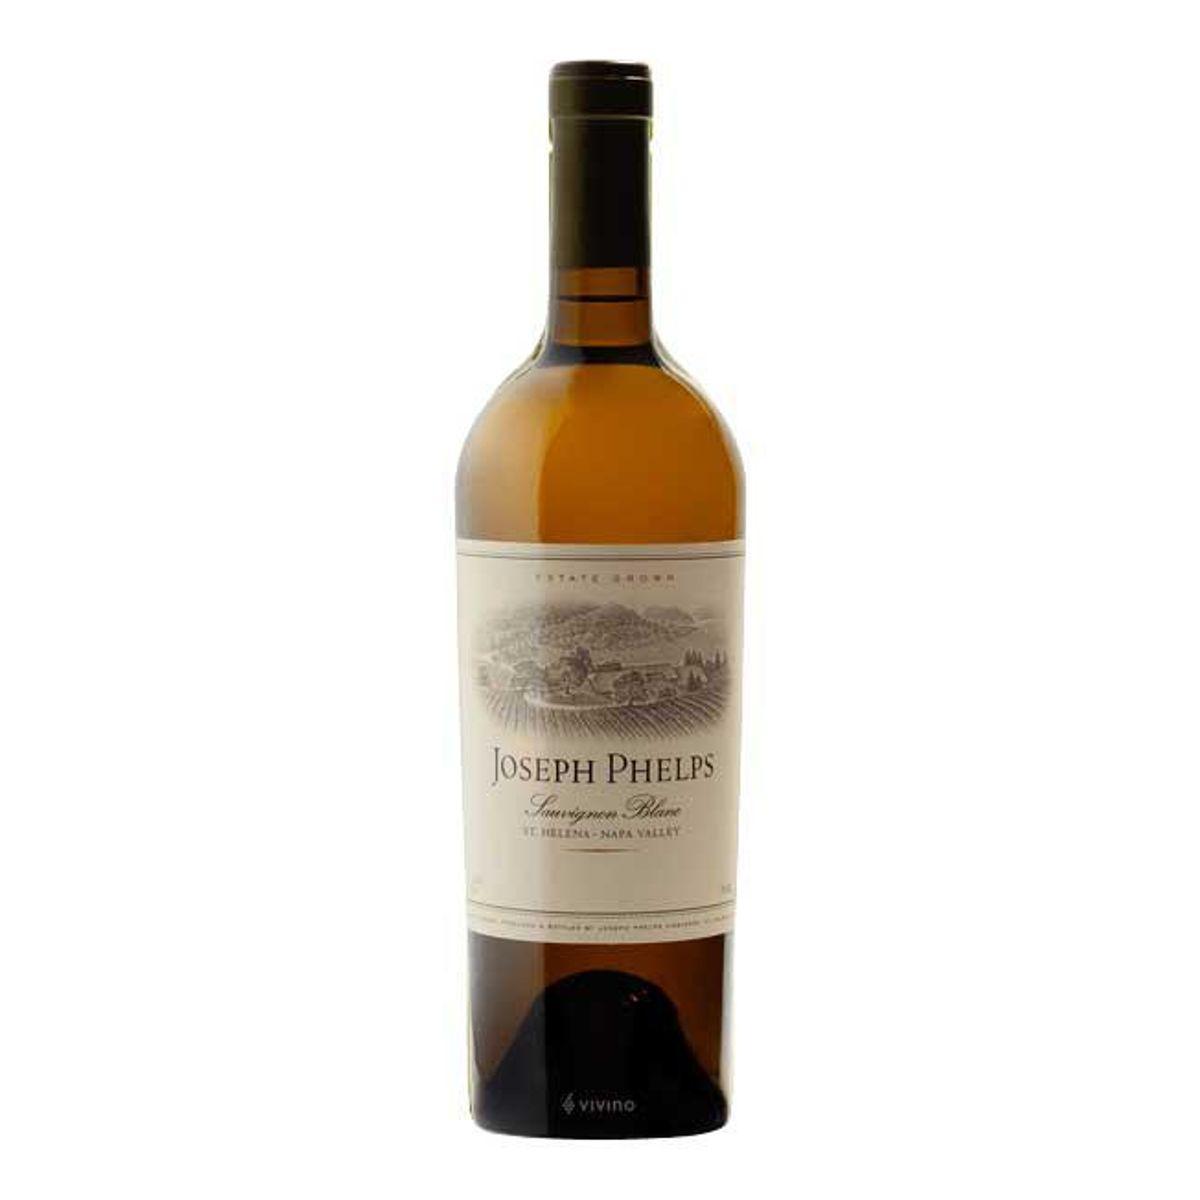 joseph phelps sauvignon blanc 2019